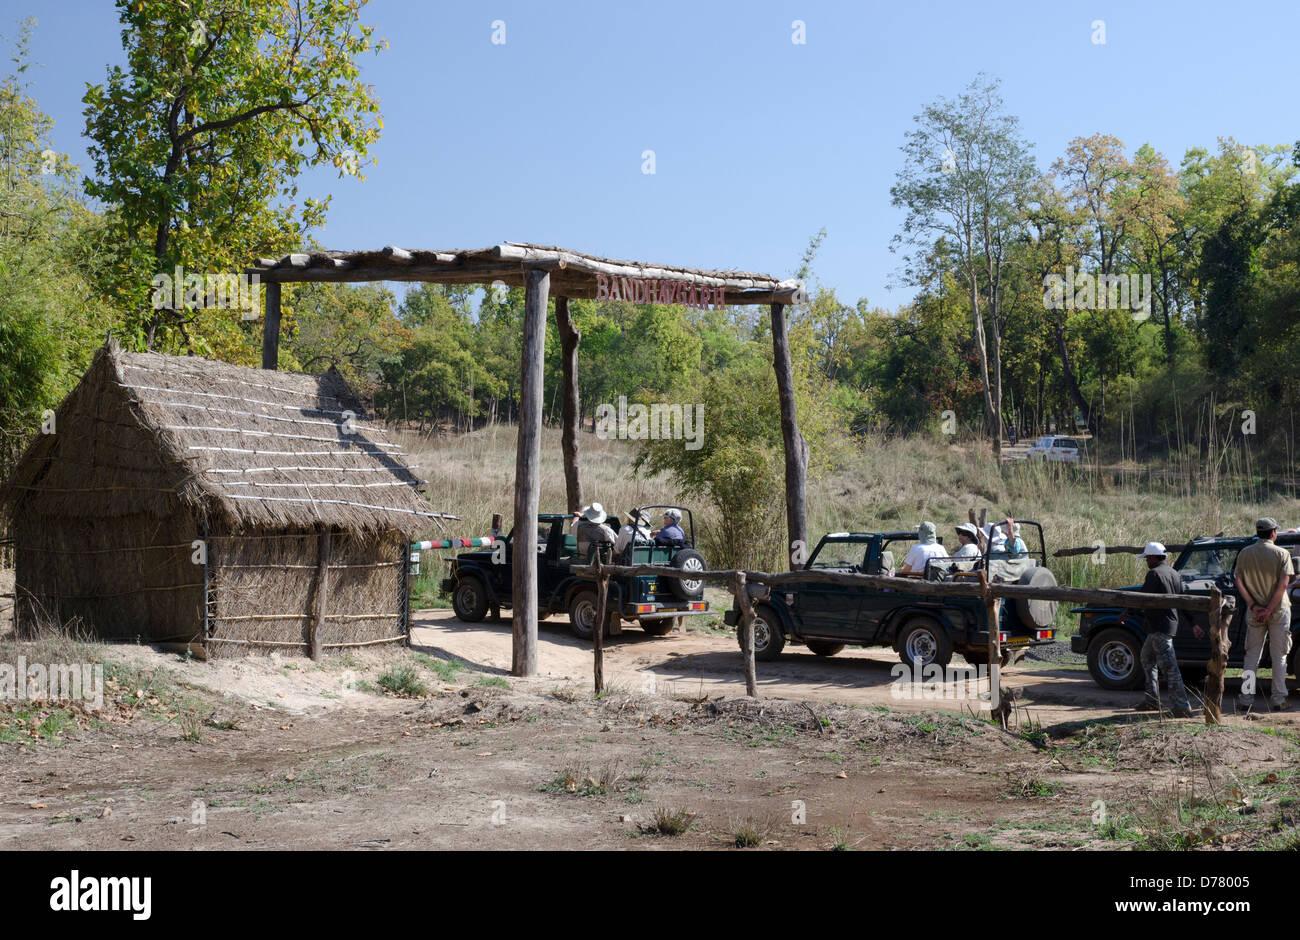 tourist jeeps,waiting for entry,zone 2,bandhavgarh,national park,madhya pradesh,india - Stock Image